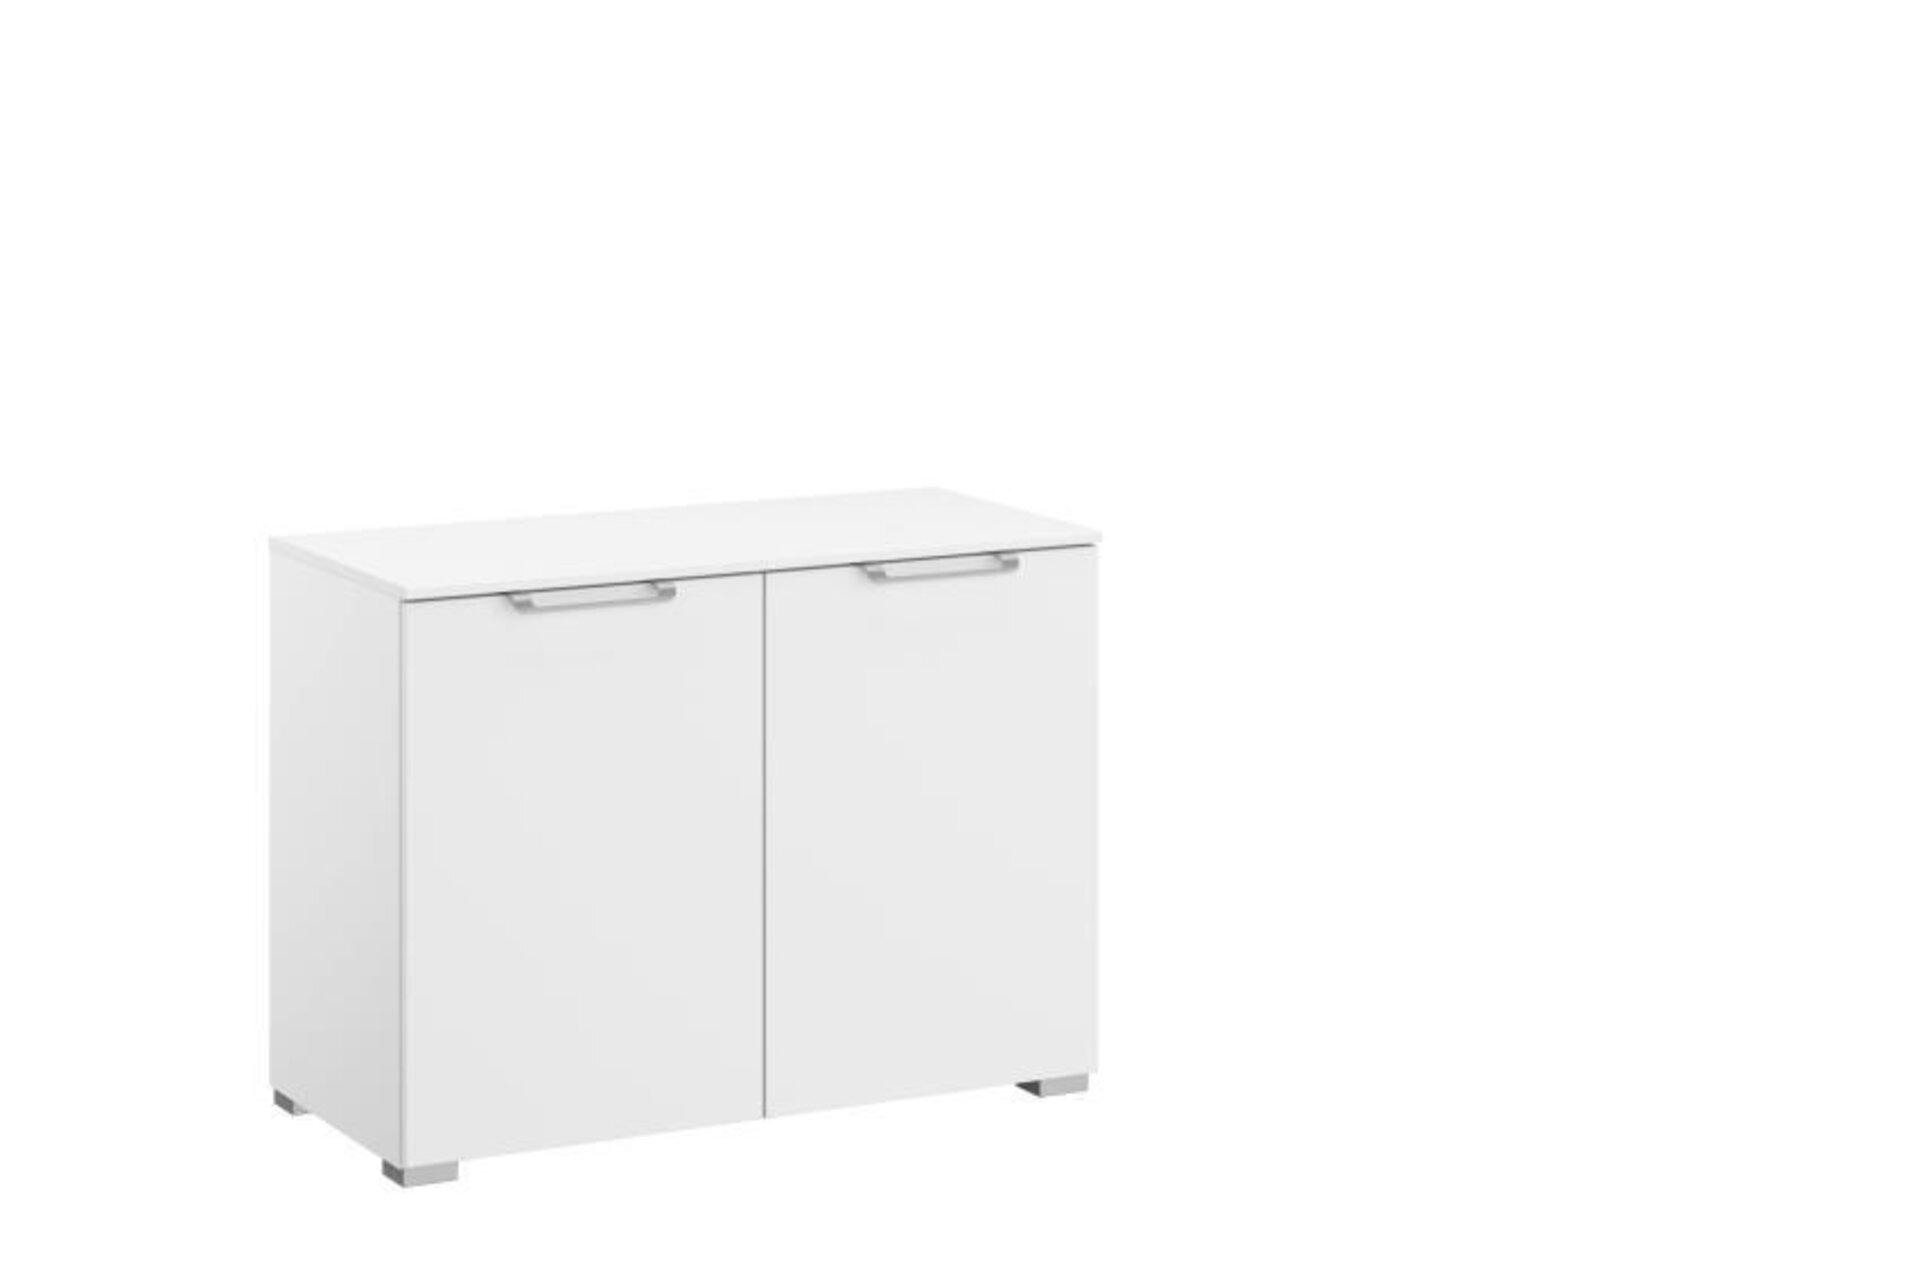 Kommode ALLSTARS Vito Holzwerkstoff weiß 42 x 61 x 80 cm